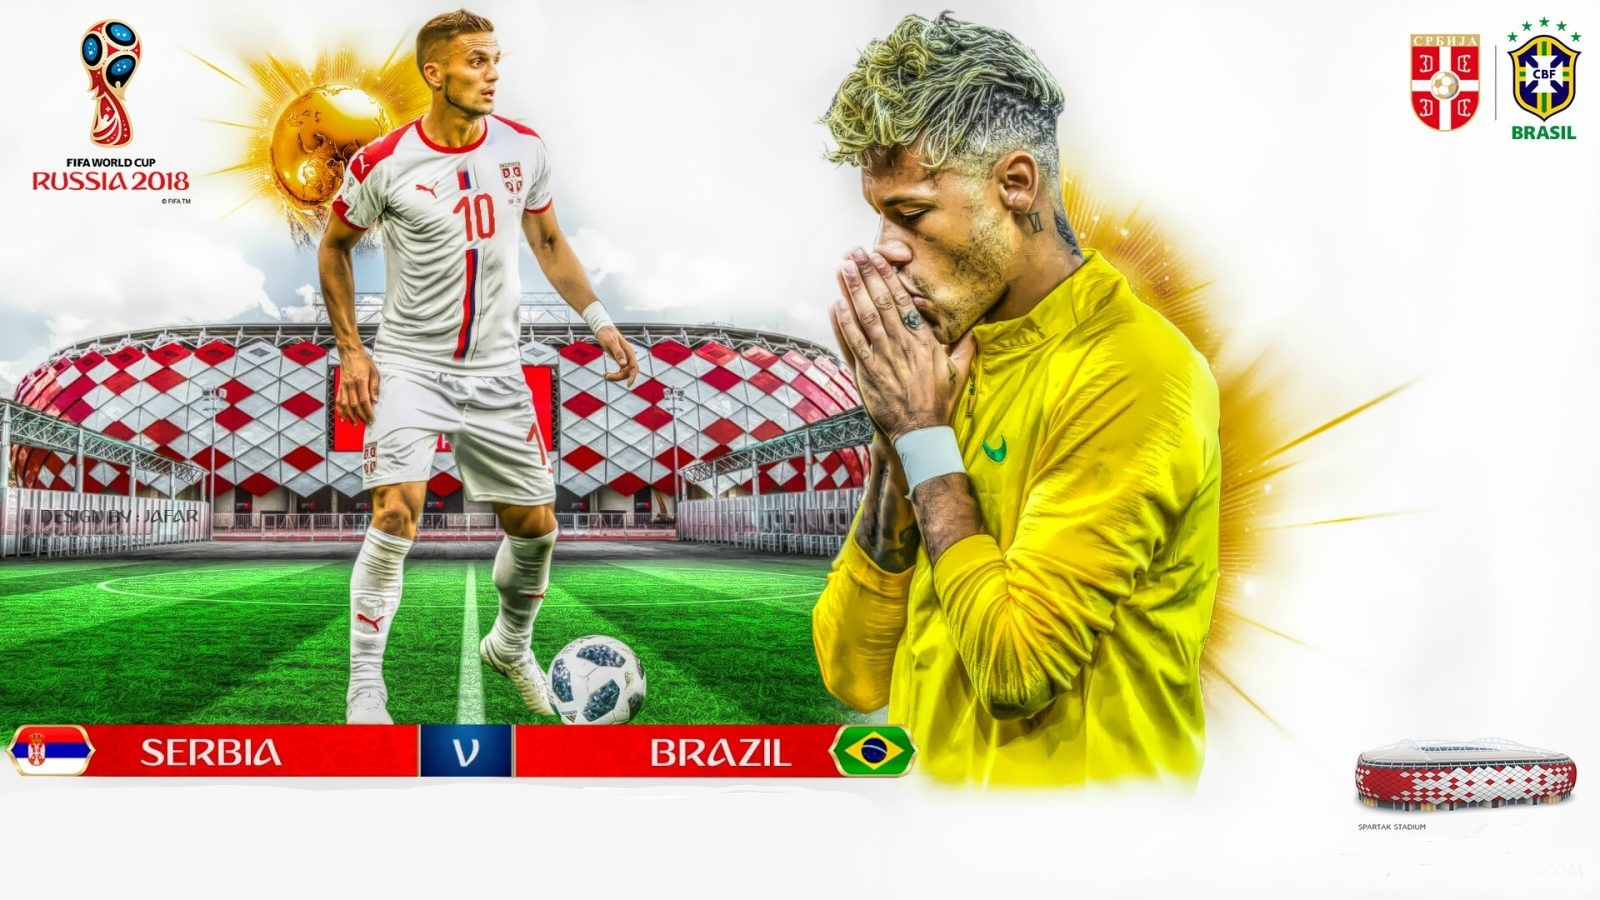 serbia_brazil_world_cup_2018-1600x900.jpg